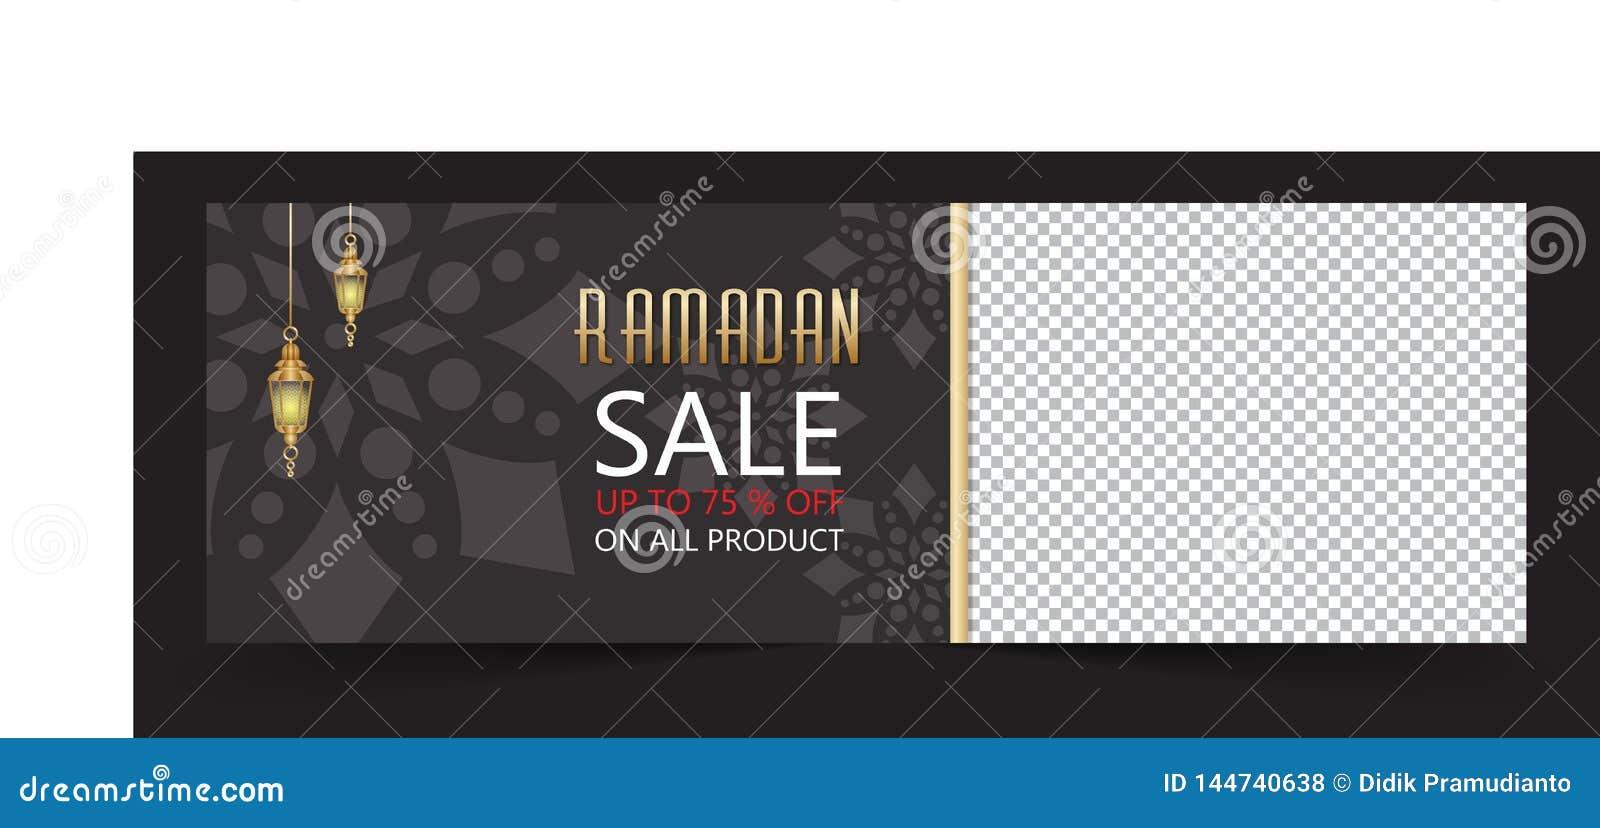 Ramadan sale banner with black background